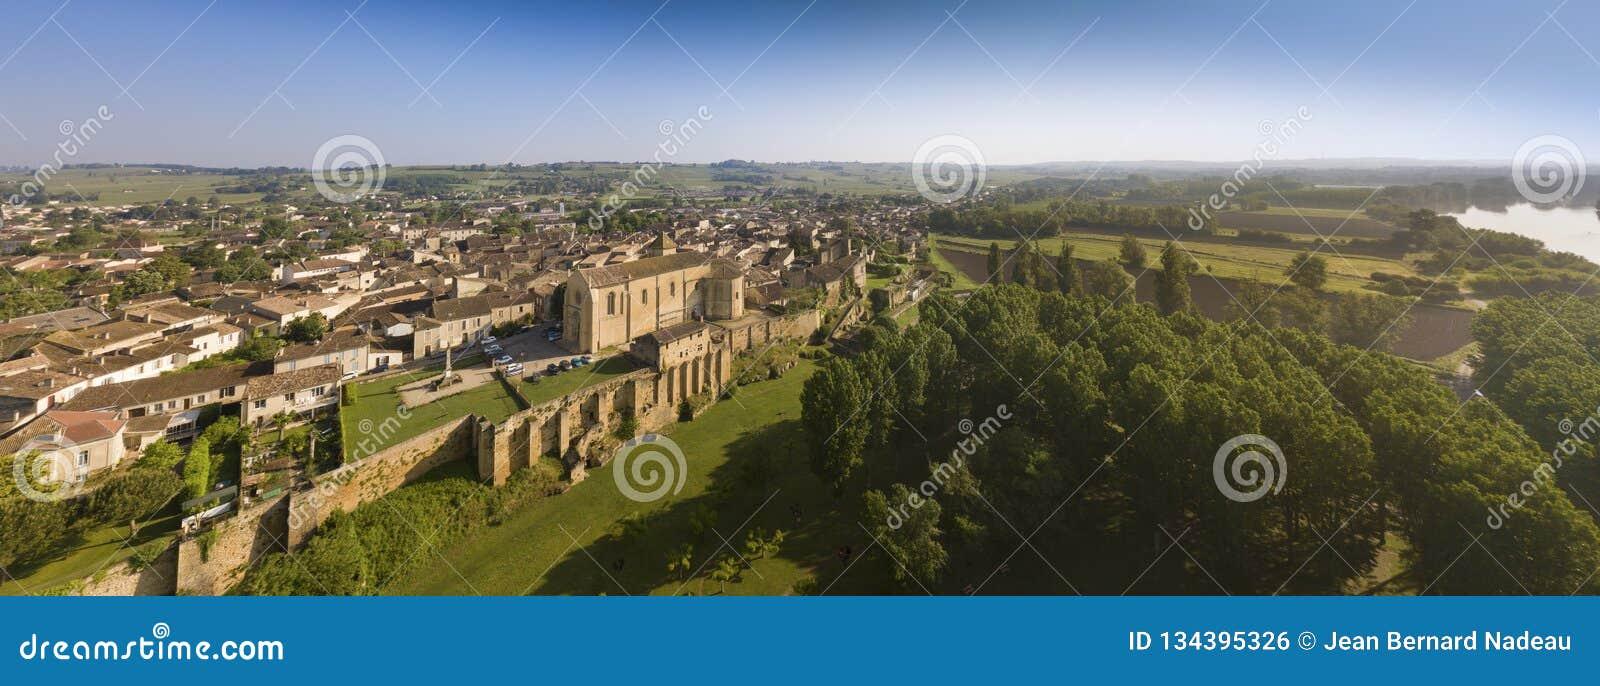 Aerial View Of Saint-Macaire, Bordeaux Region, Gironde ...